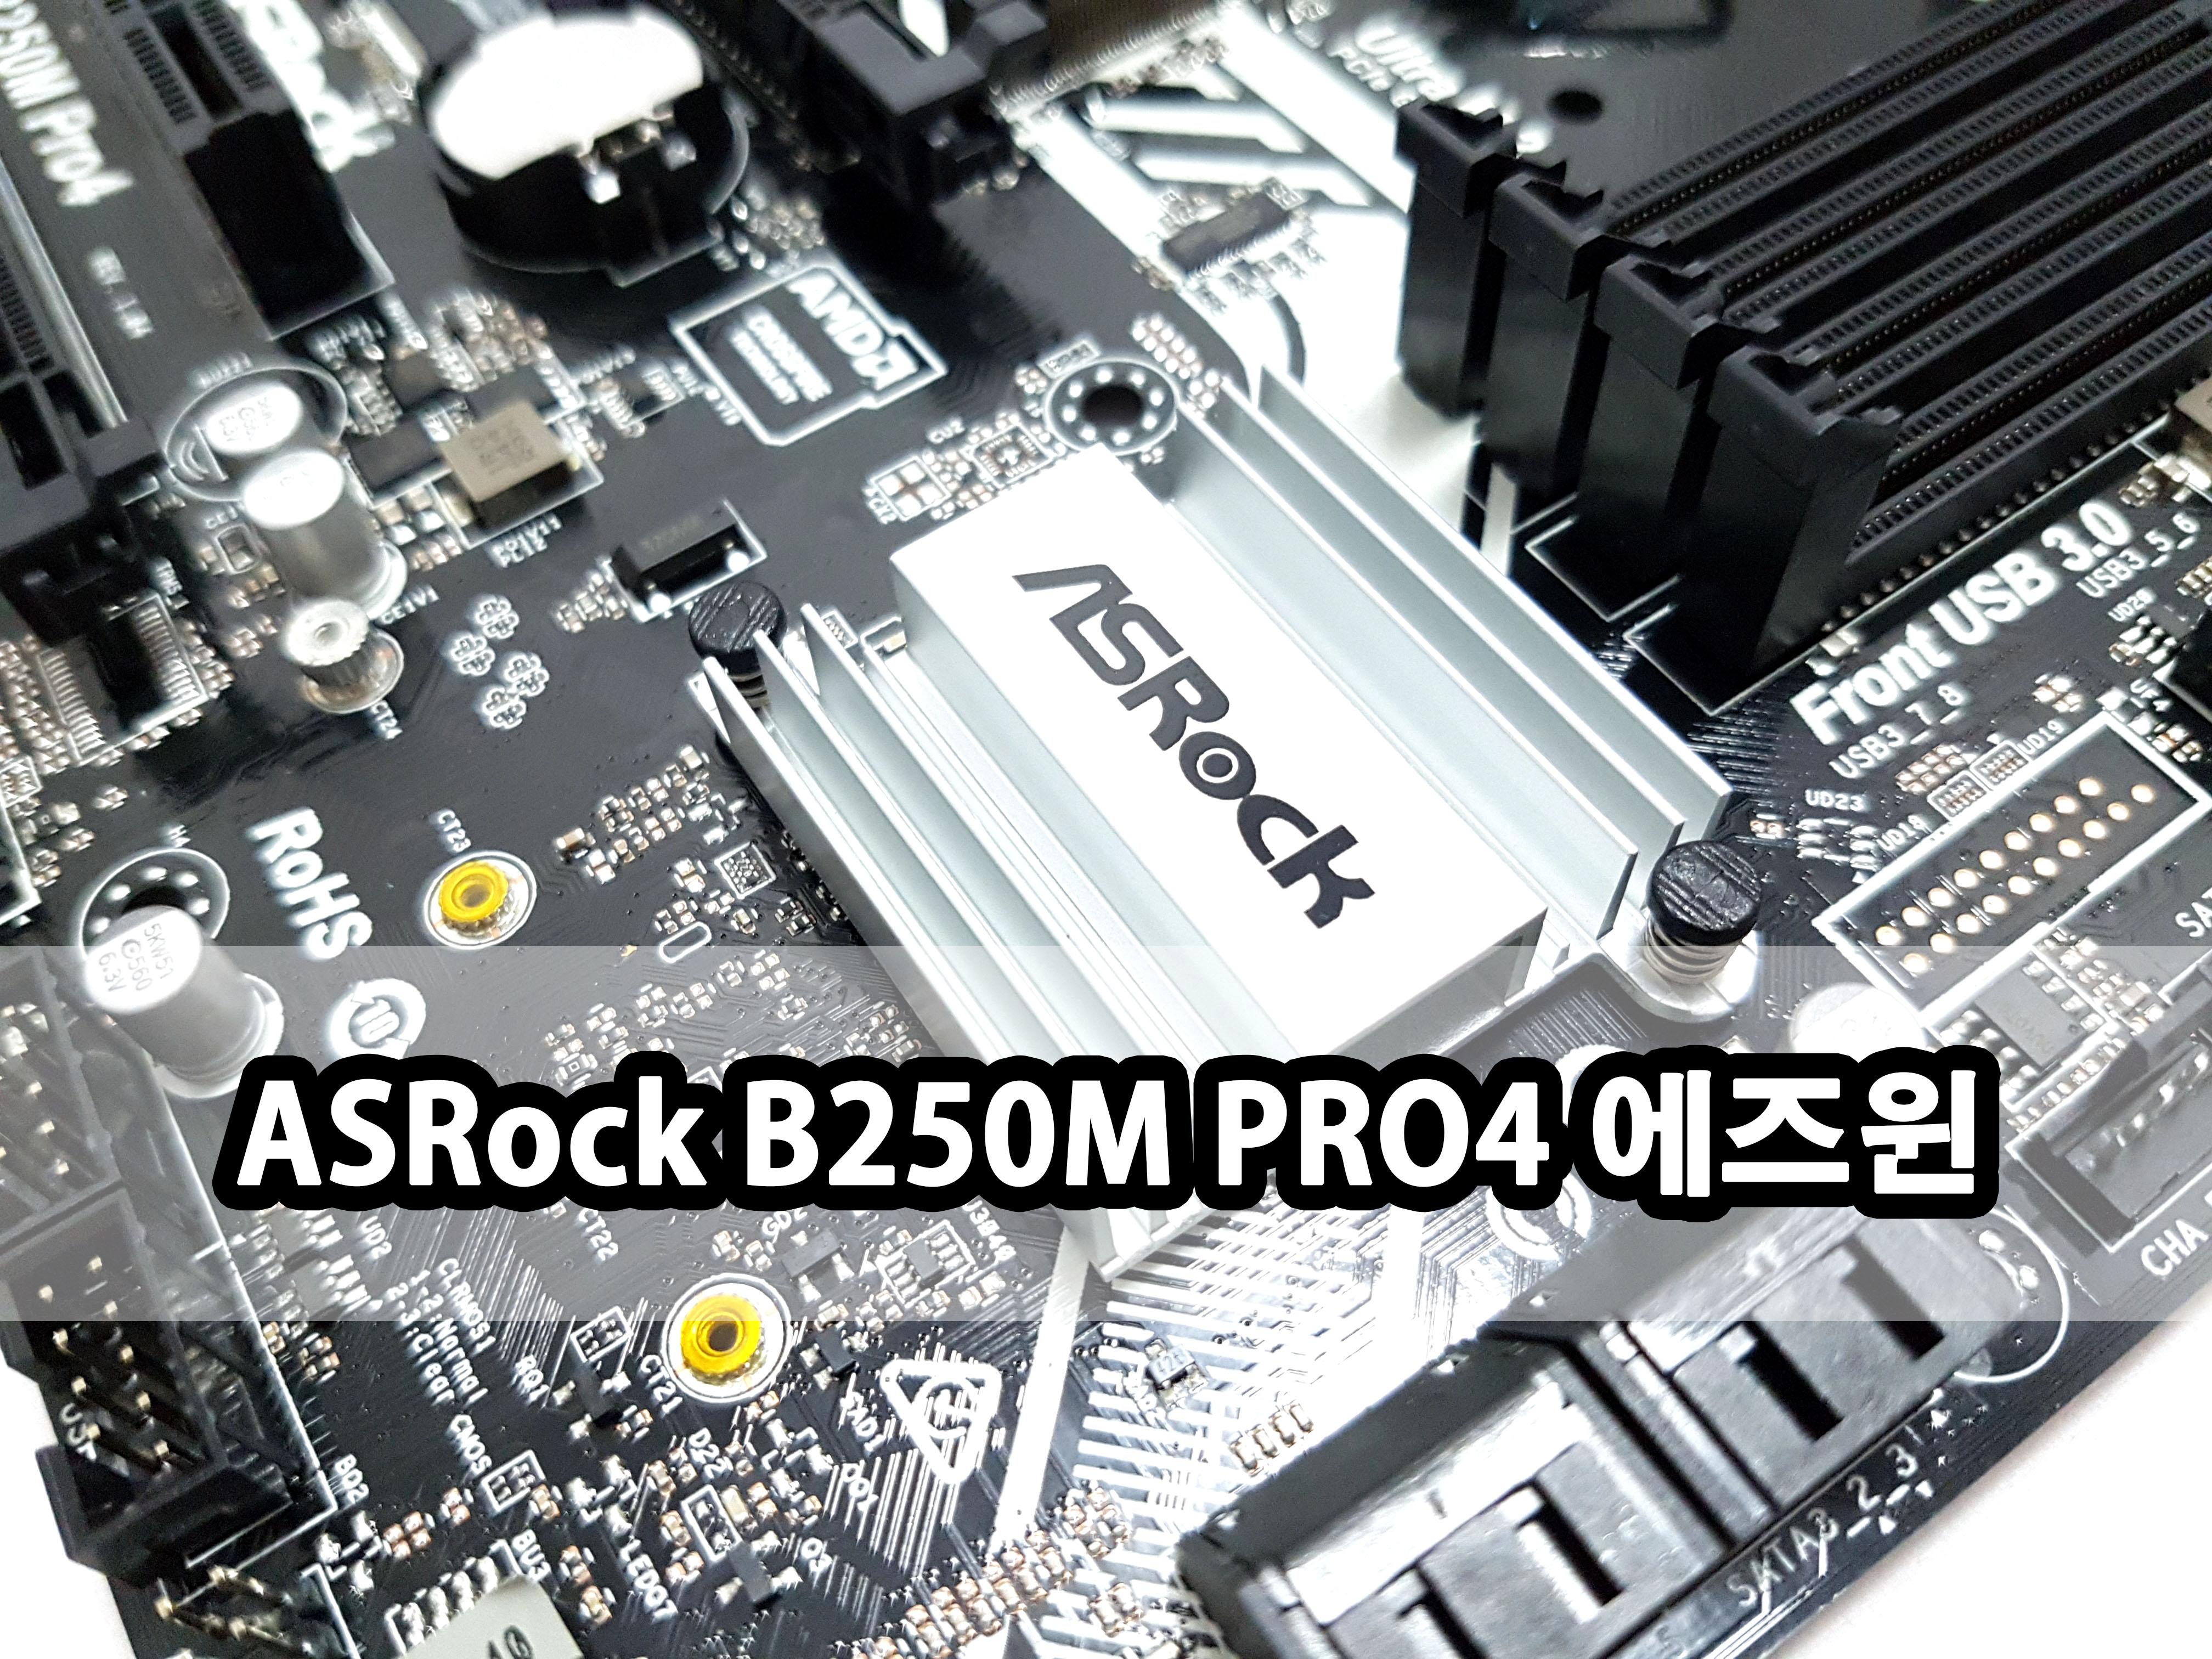 ASRock B250M PRO4 에즈윈 : 인텔 카...